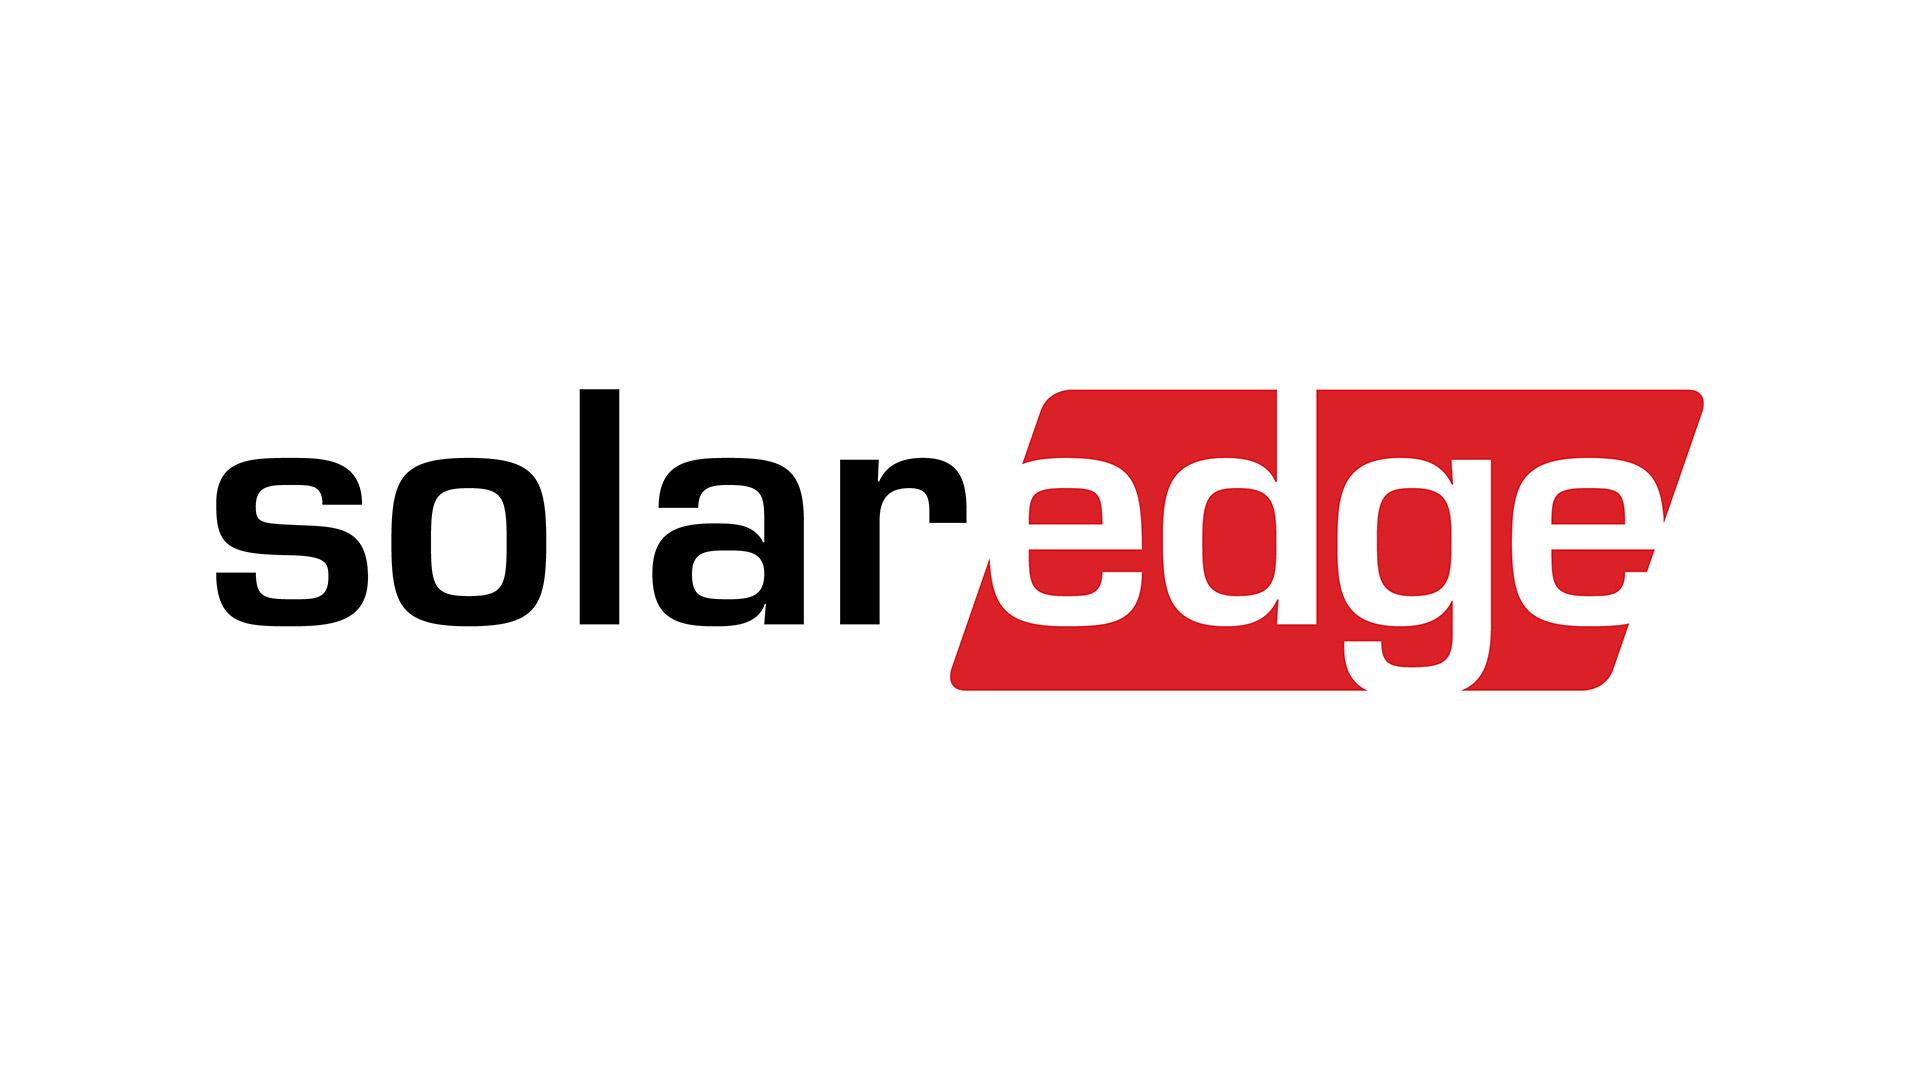 logo solaredge